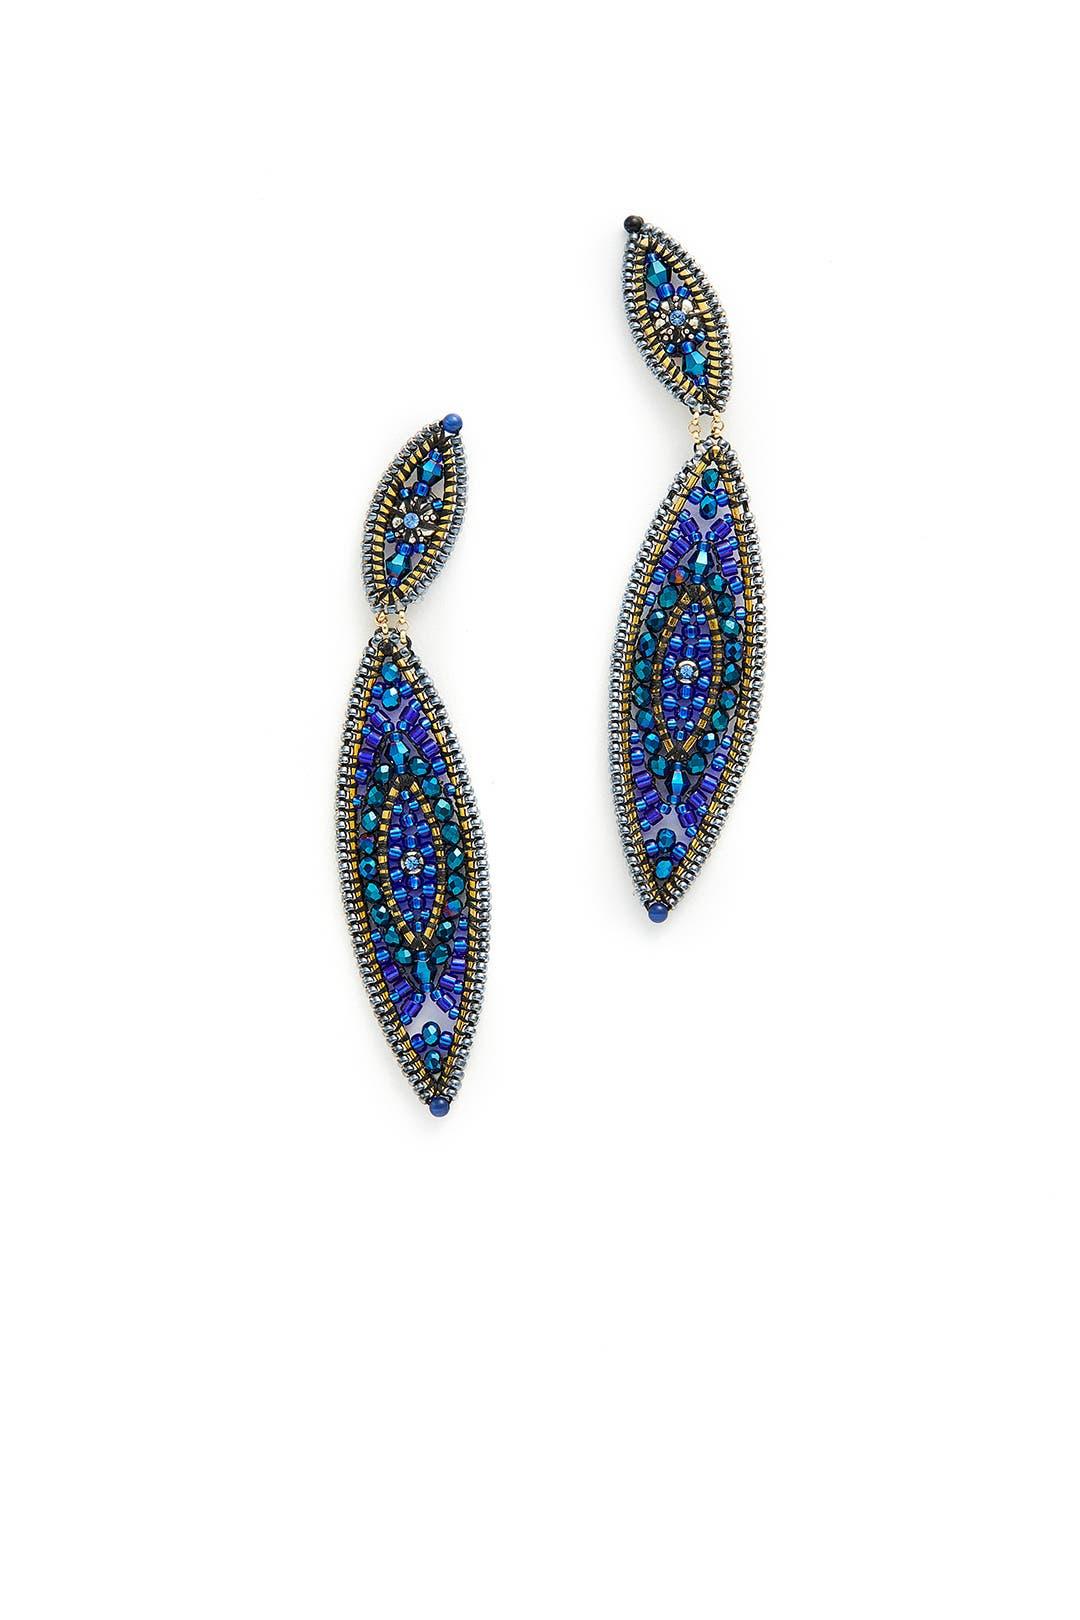 Miguel Ases Sapphire Bay Leaf Earrings